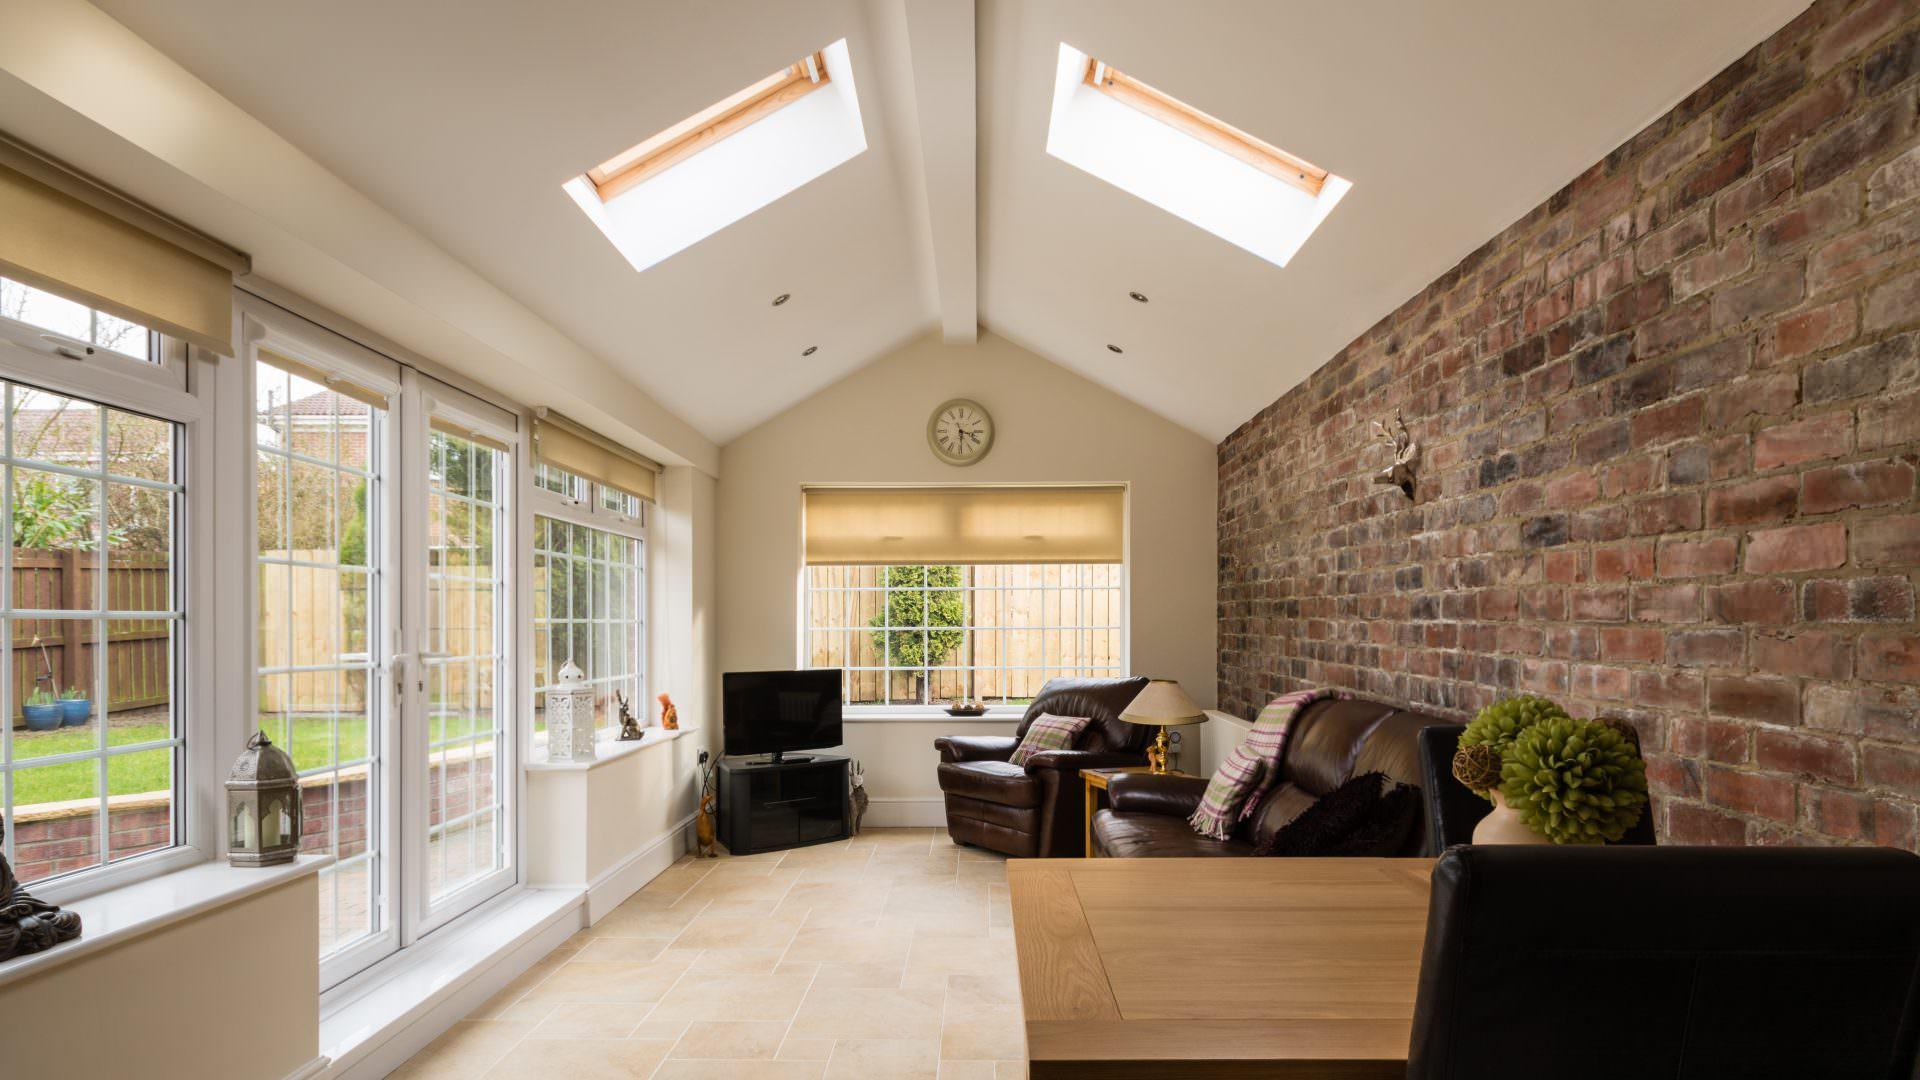 Single Storey Extensions in Southamptonn